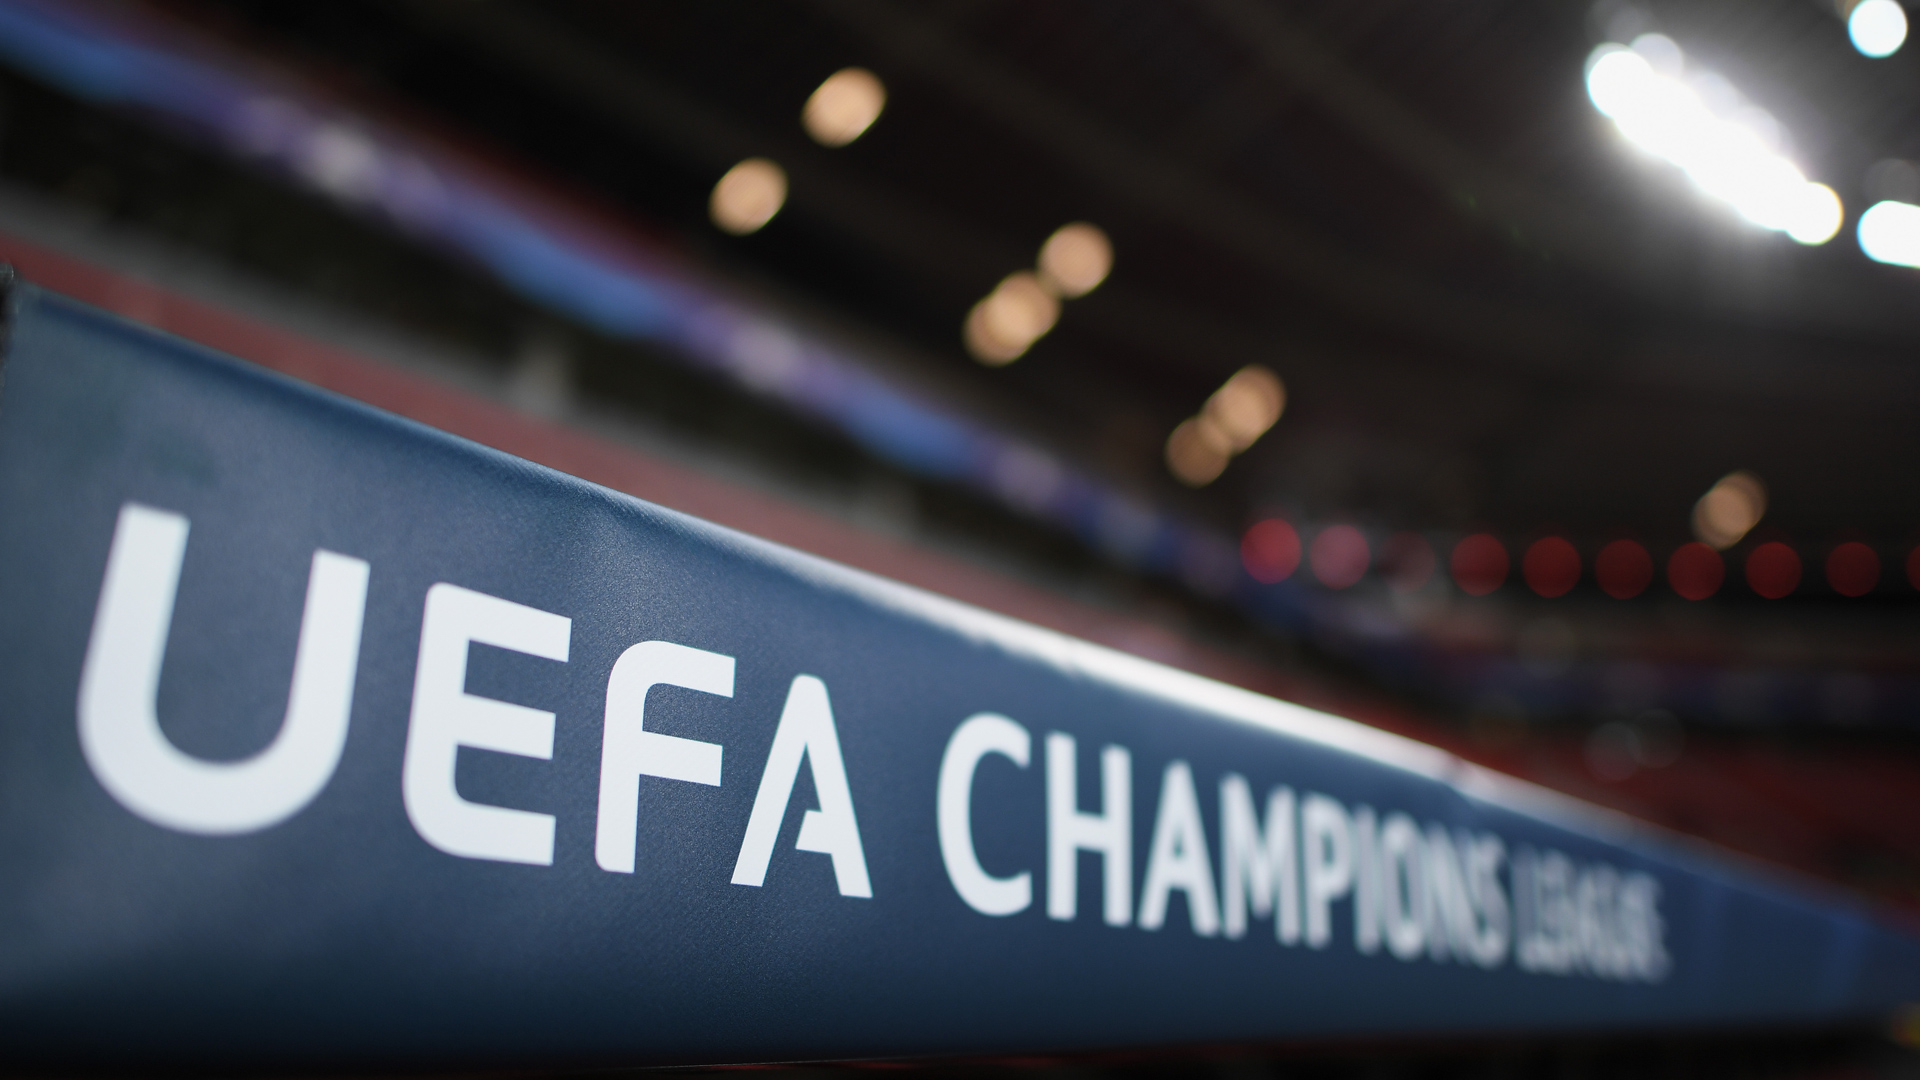 uefa champions league tabelle